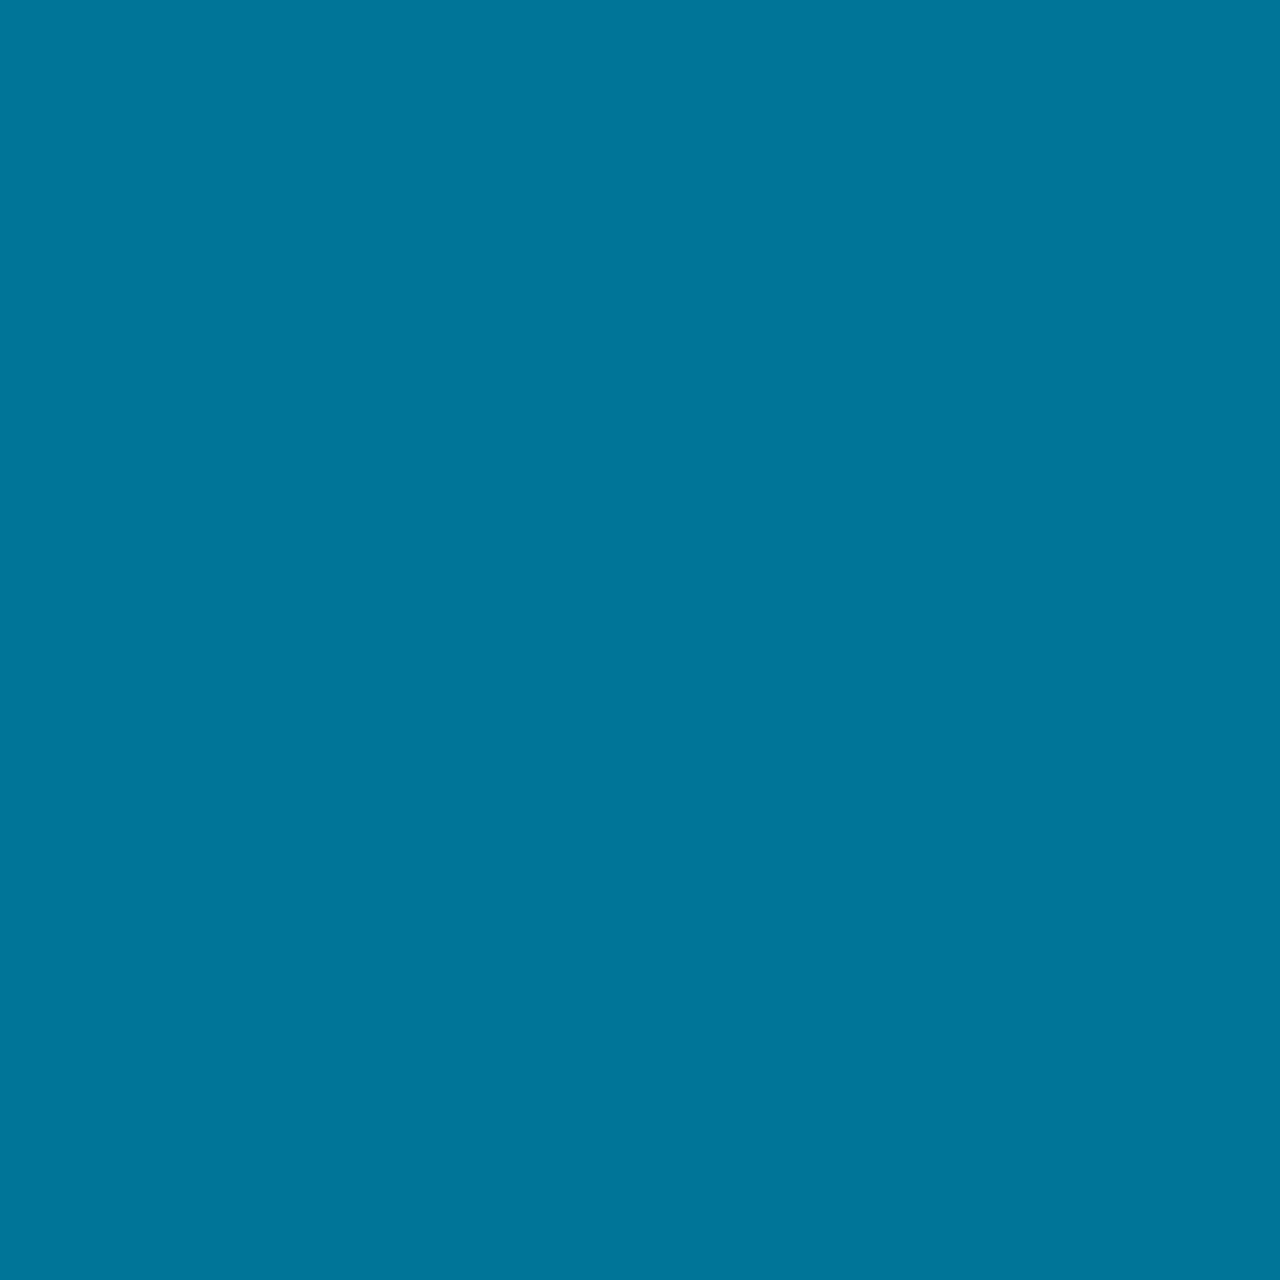 "#0376 Rosco Gels Roscolux Bermuda Blue, 20x24"""